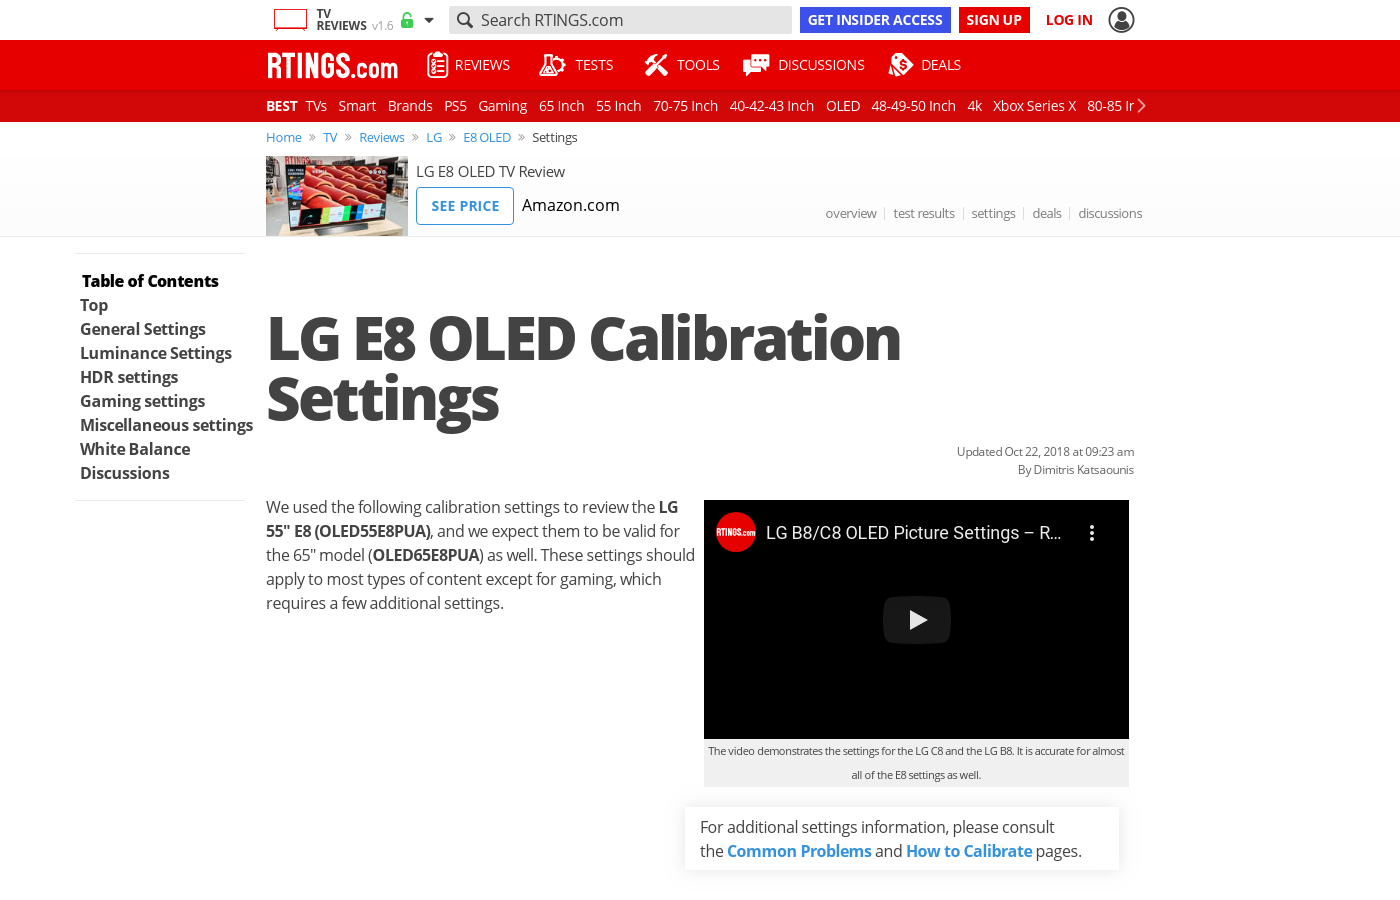 LG E8 OLED Calibration Settings - RTINGS com